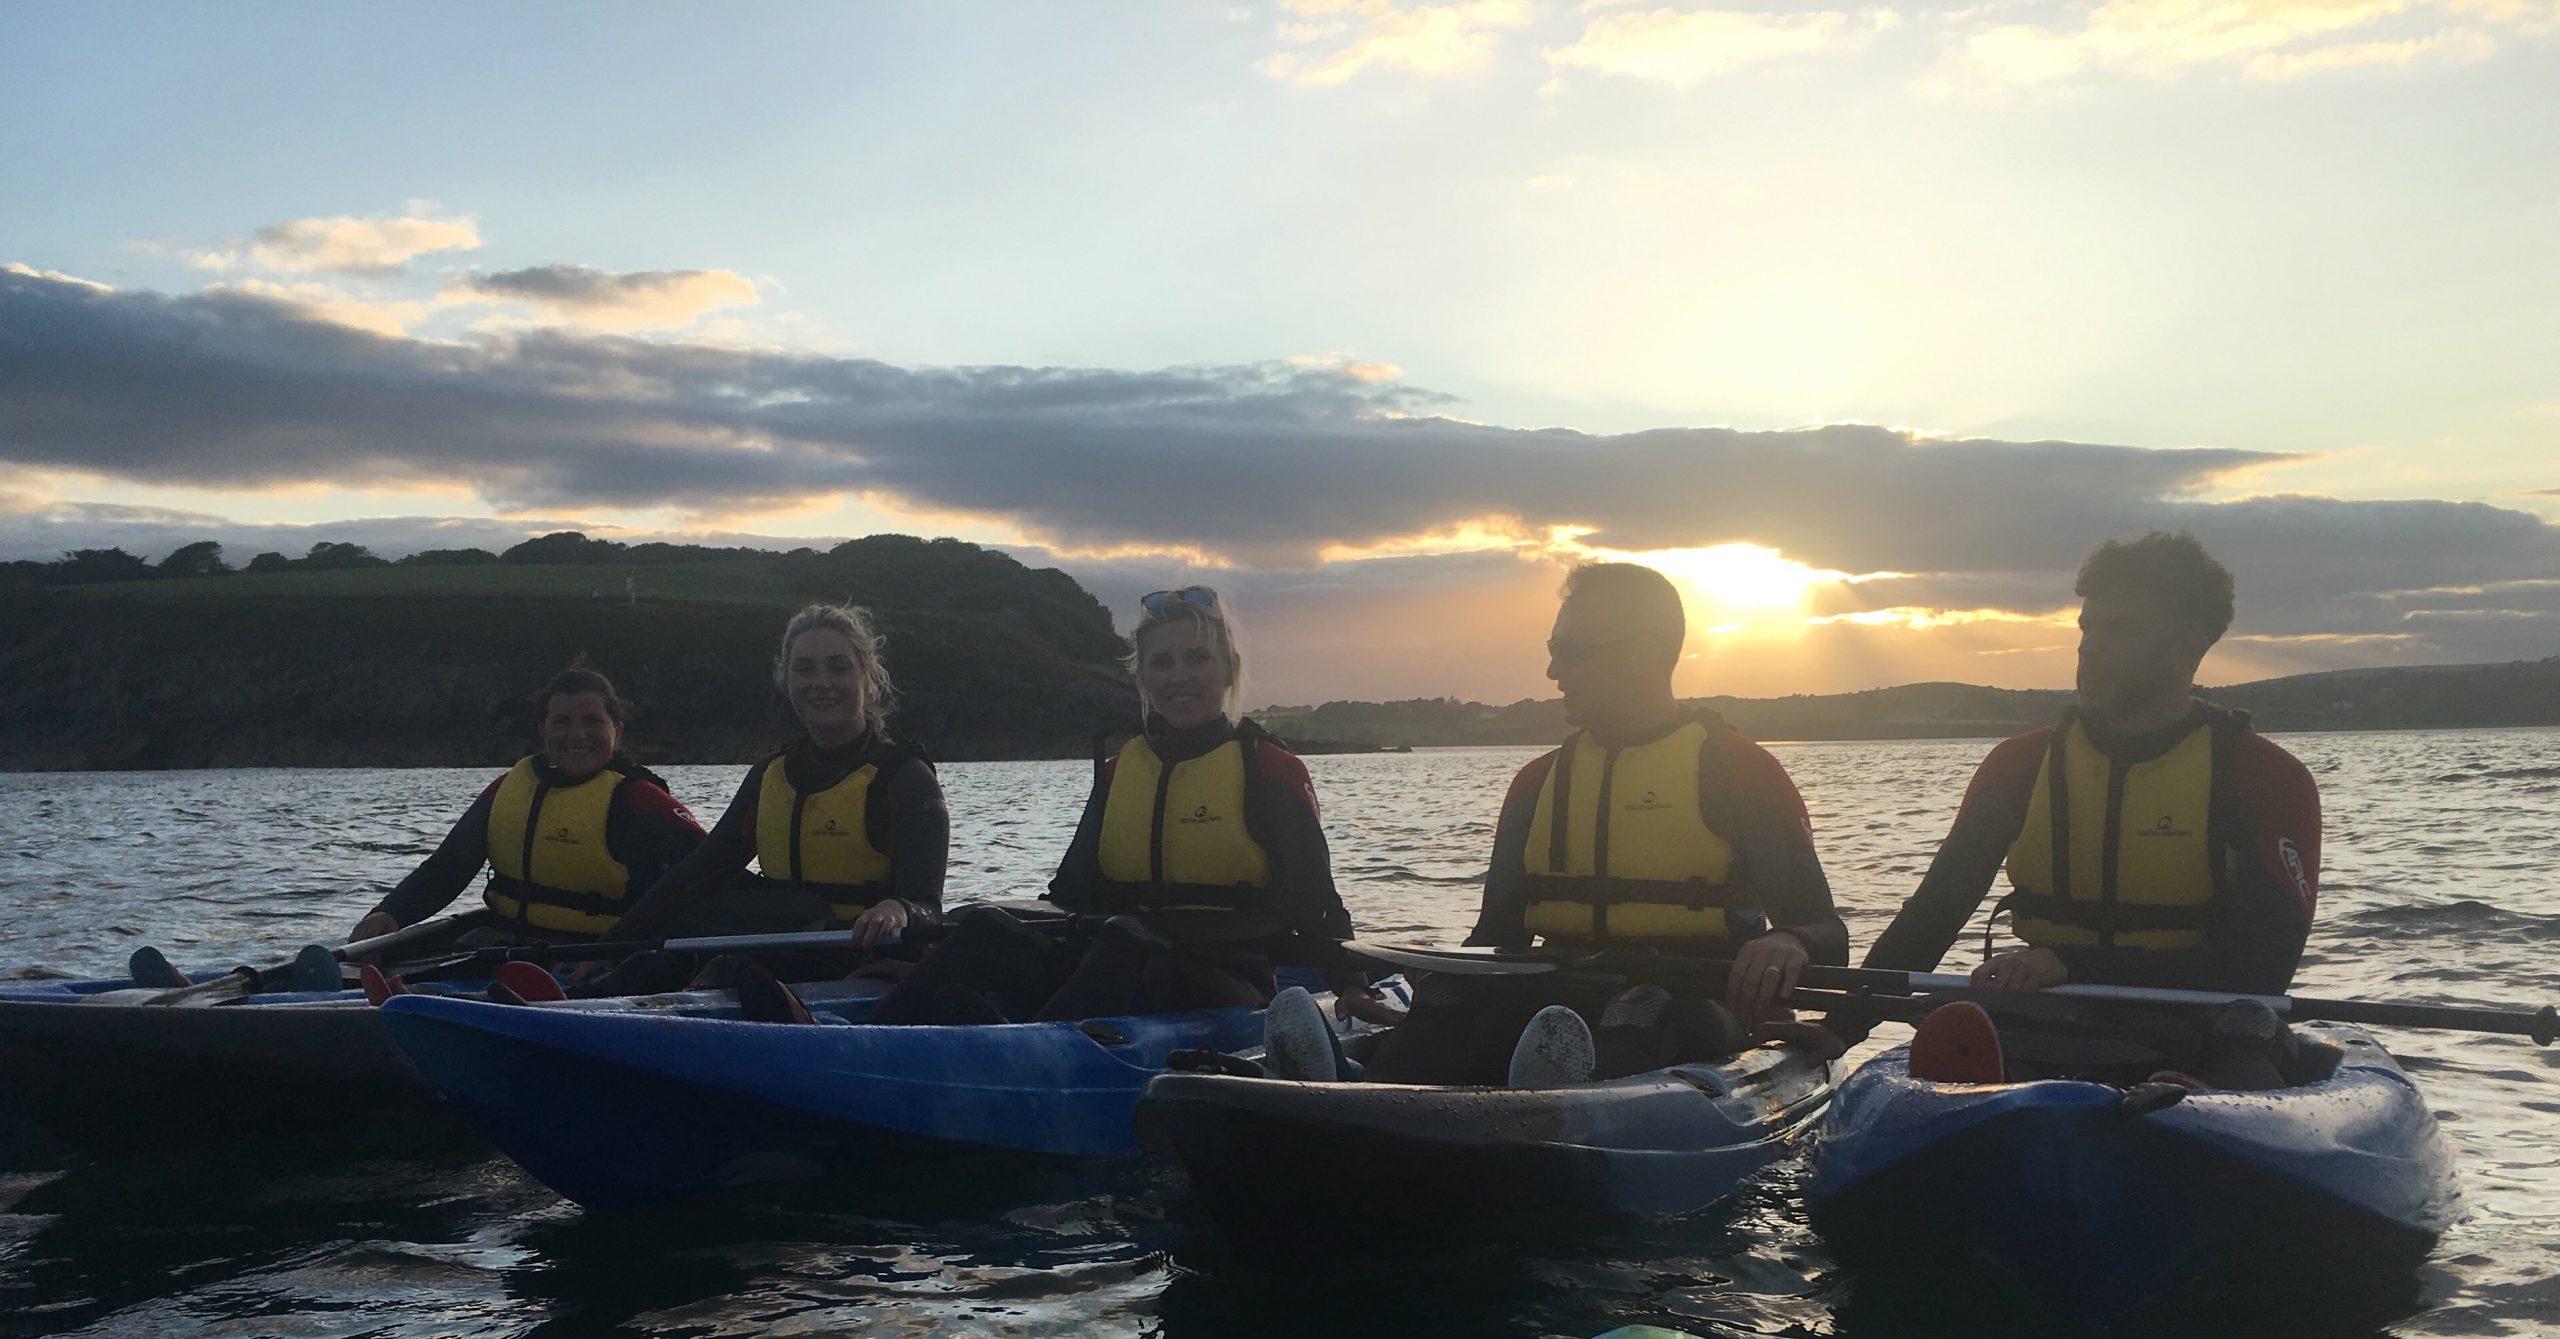 sunset sea kayak coast tour courtmacsherry cork ireland